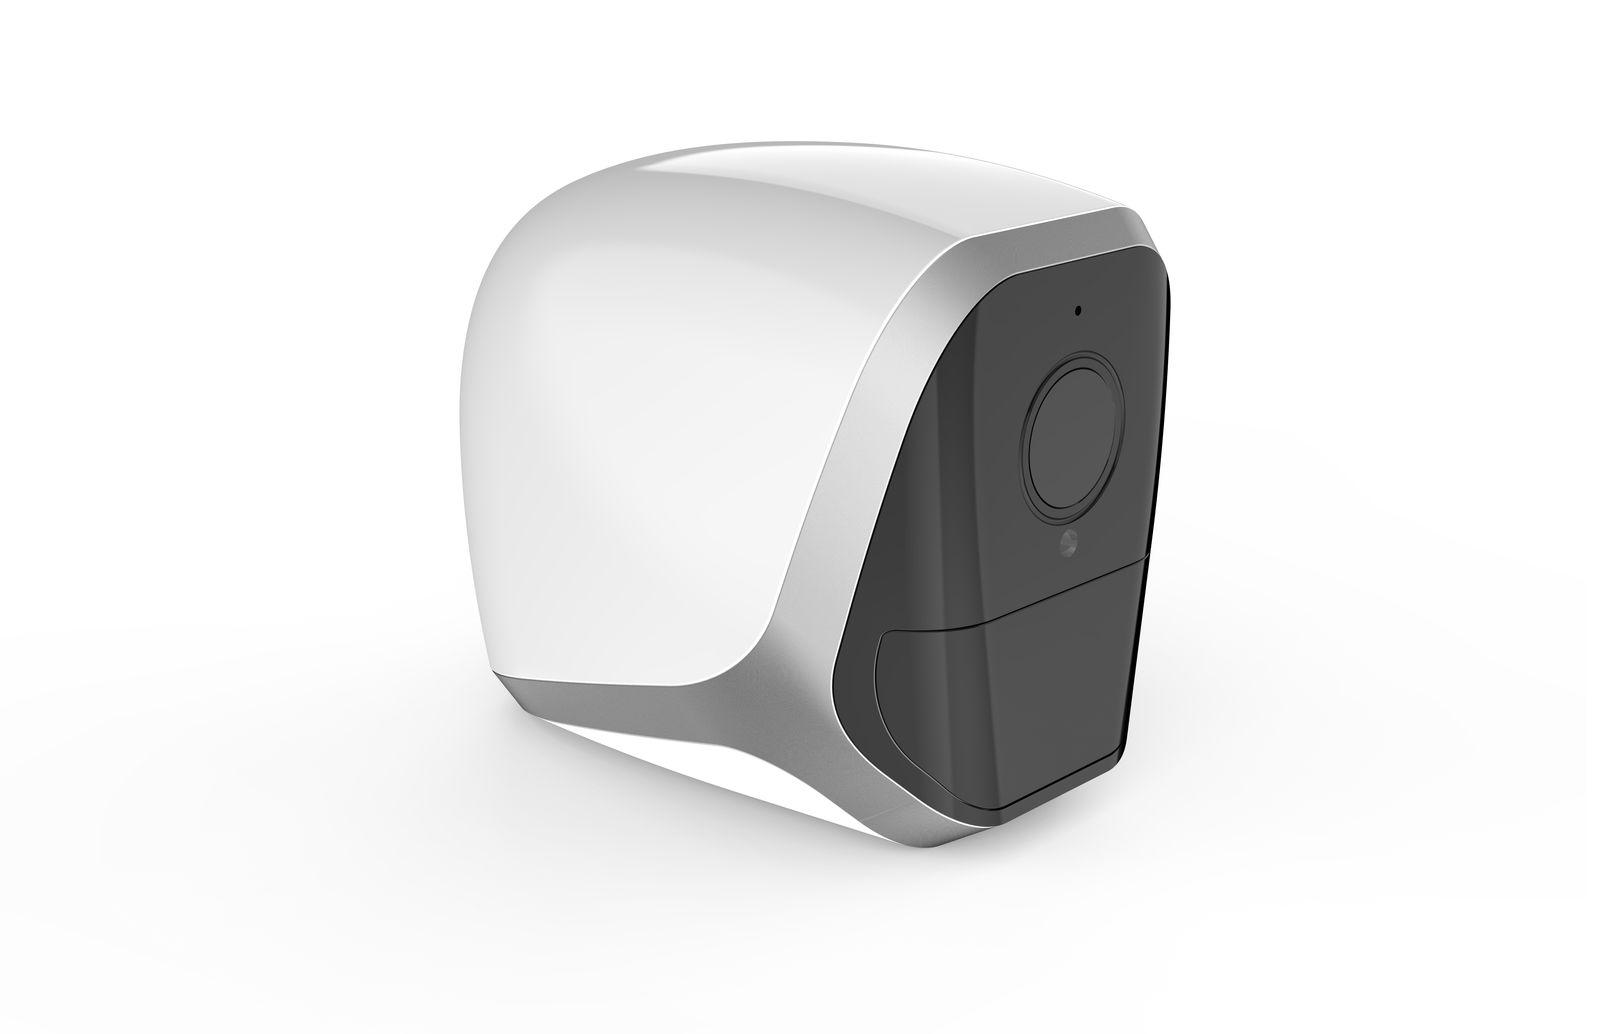 wlan berwachungskamera mit batterie akku ip65 bis 6 monate betriebsdauer 1080p mikrofon 128gb 2. Black Bedroom Furniture Sets. Home Design Ideas